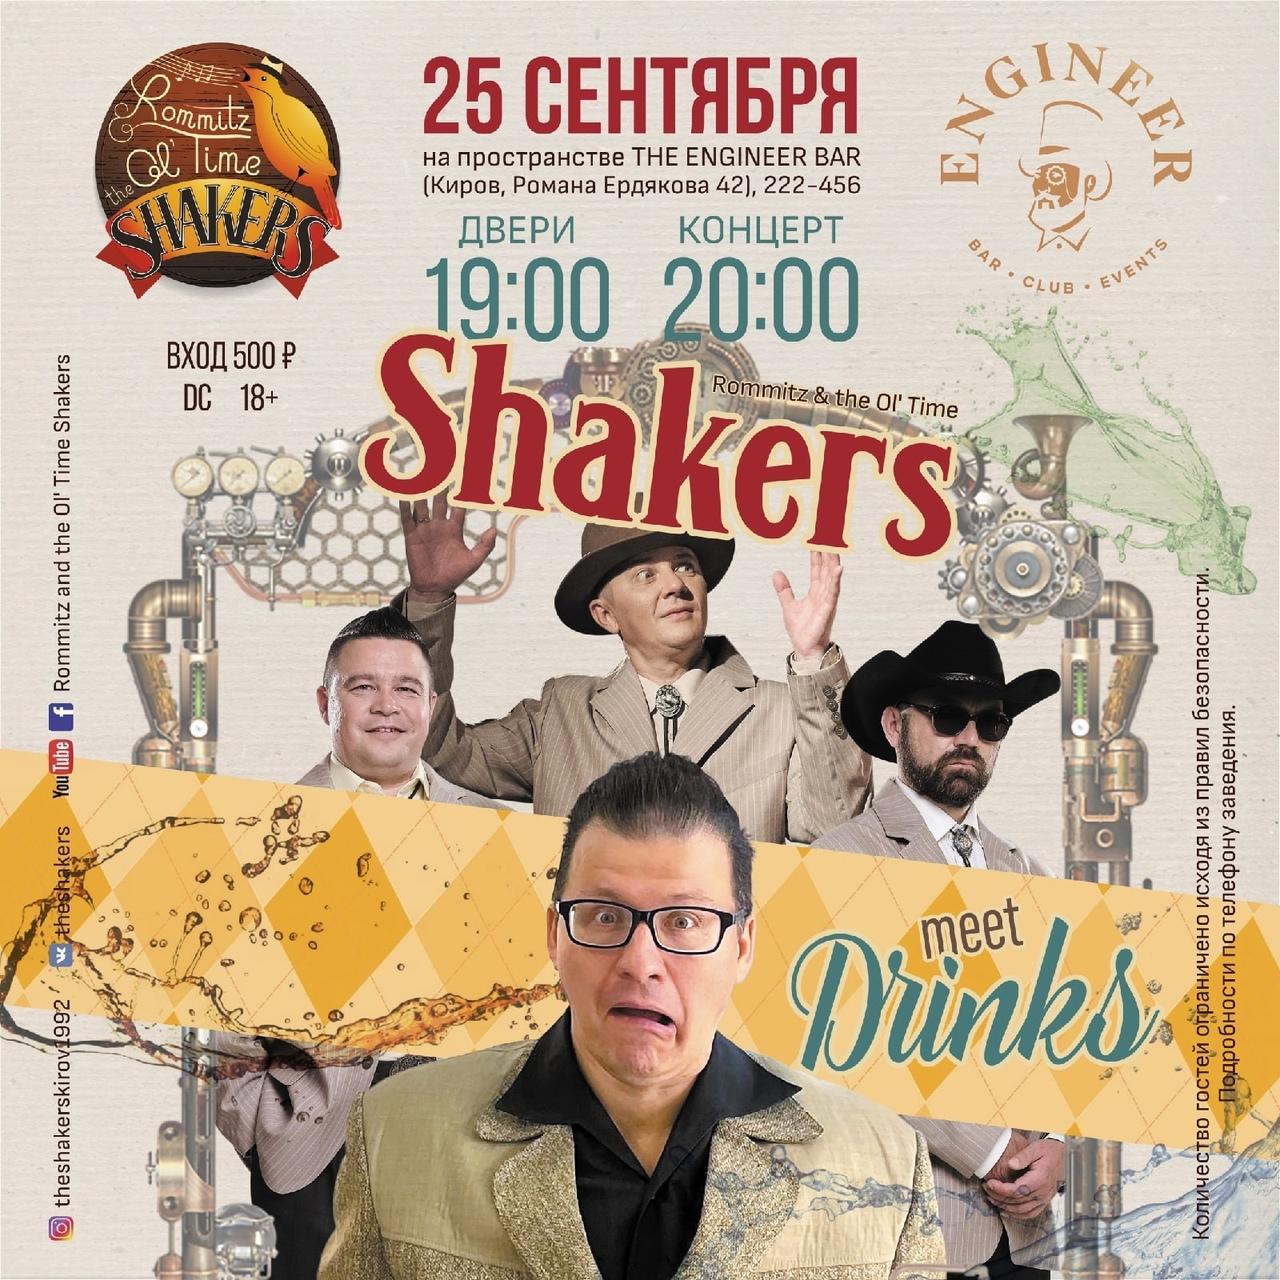 25.09 Rommitz & the Ol' Time Shakers в баре Инженер!